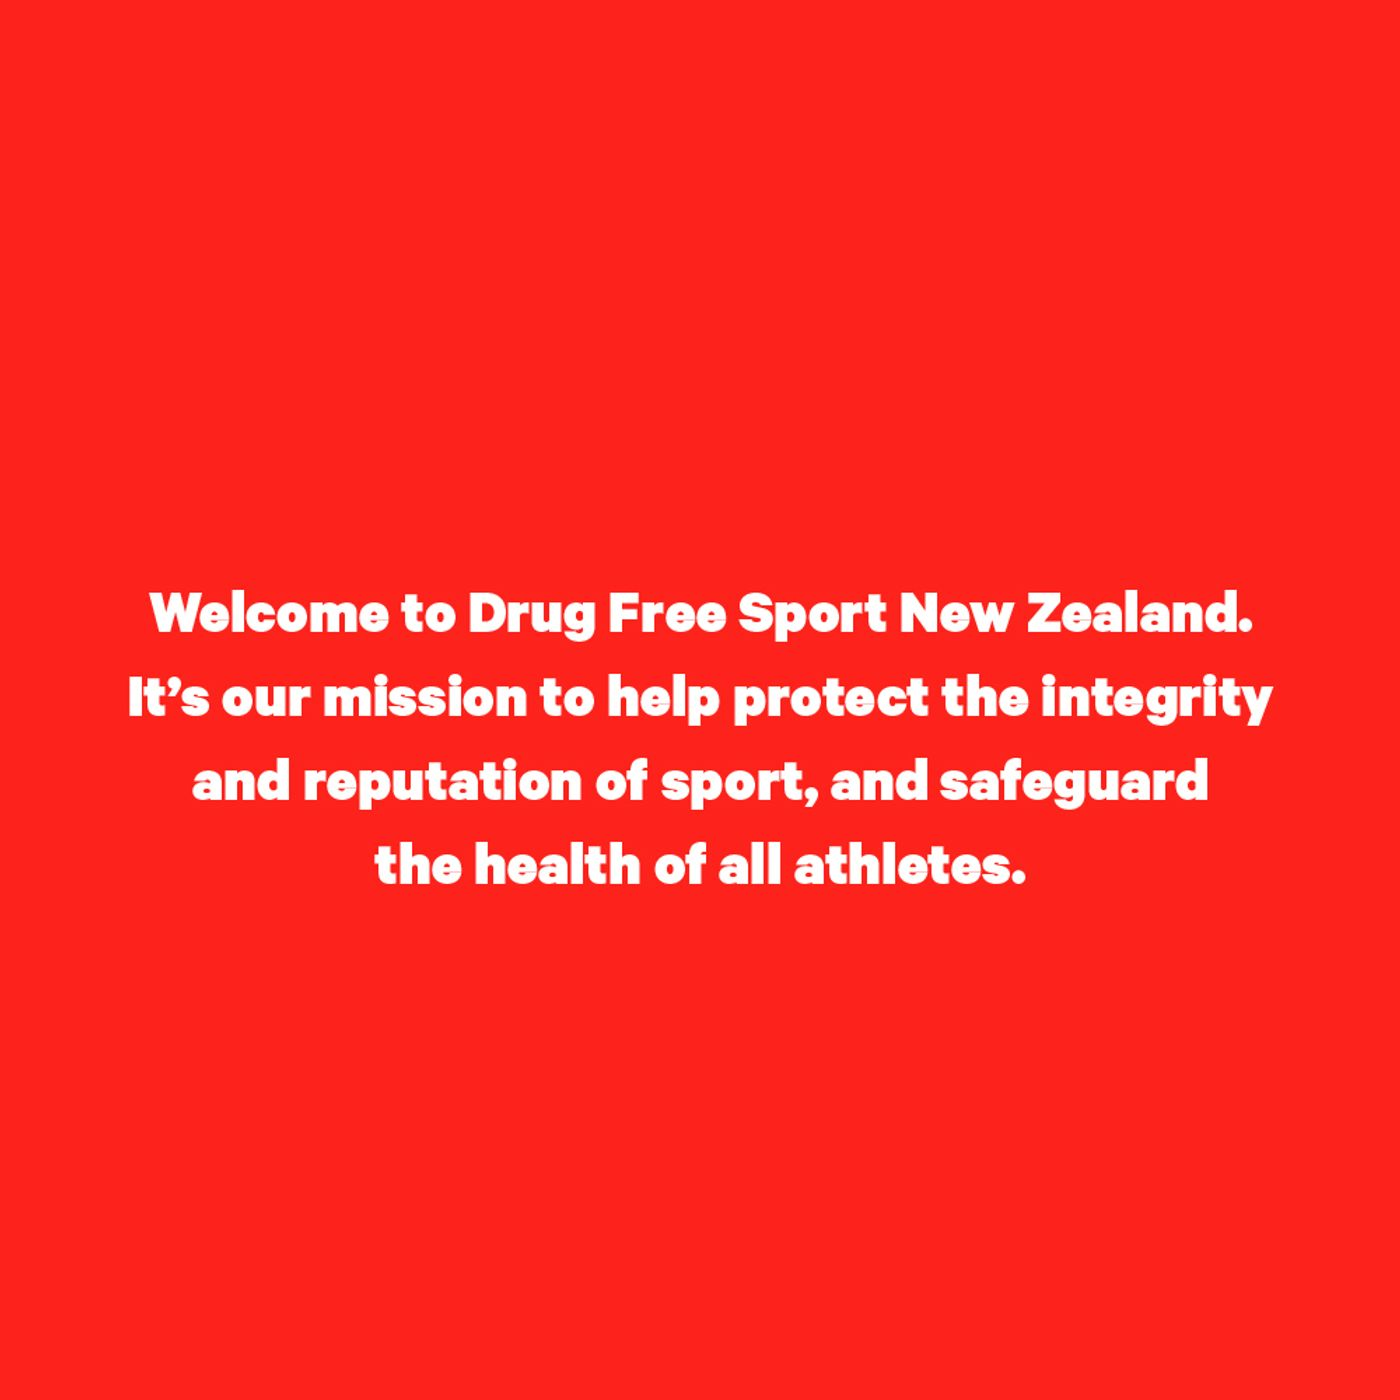 Drug free sport copy